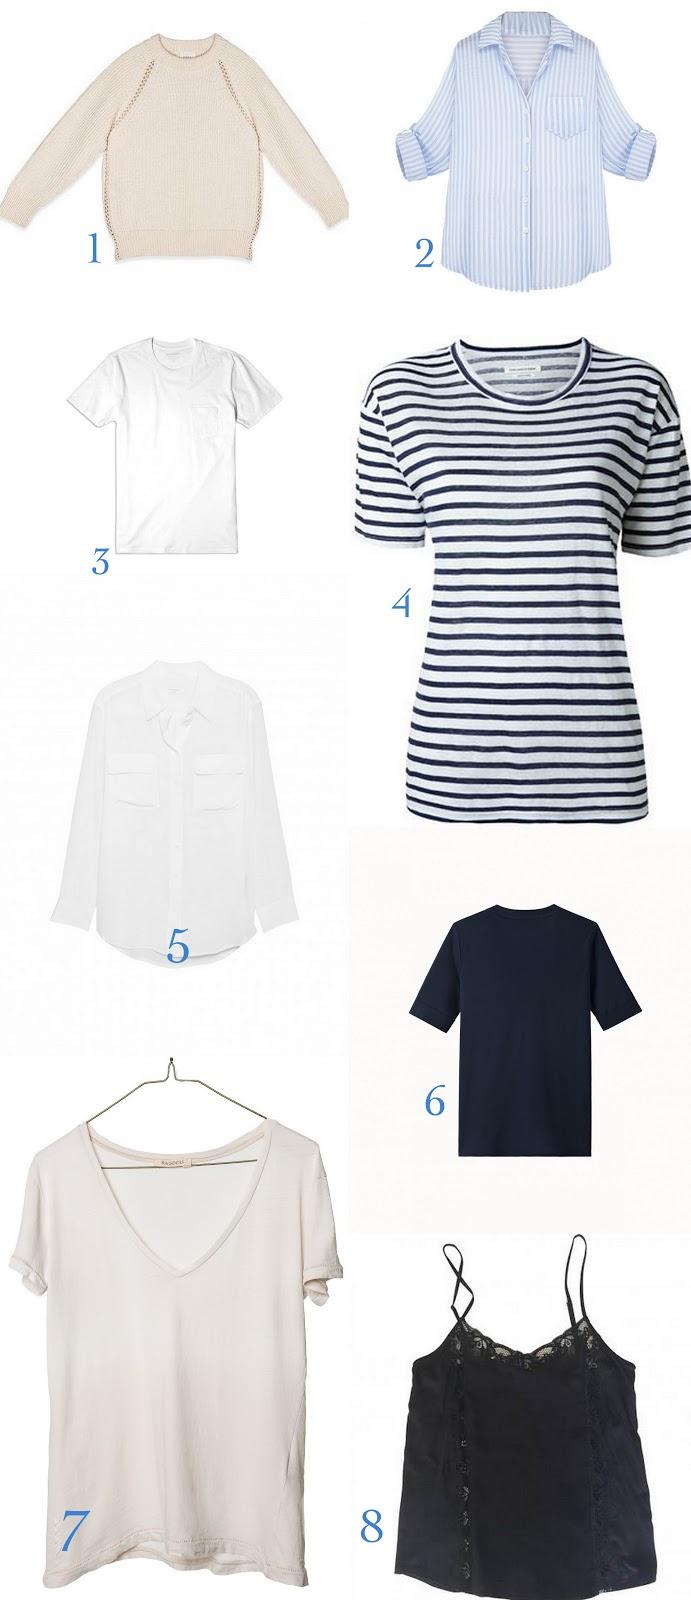 The French wardrobe, French Capsule wardrobe, what do French girls wear